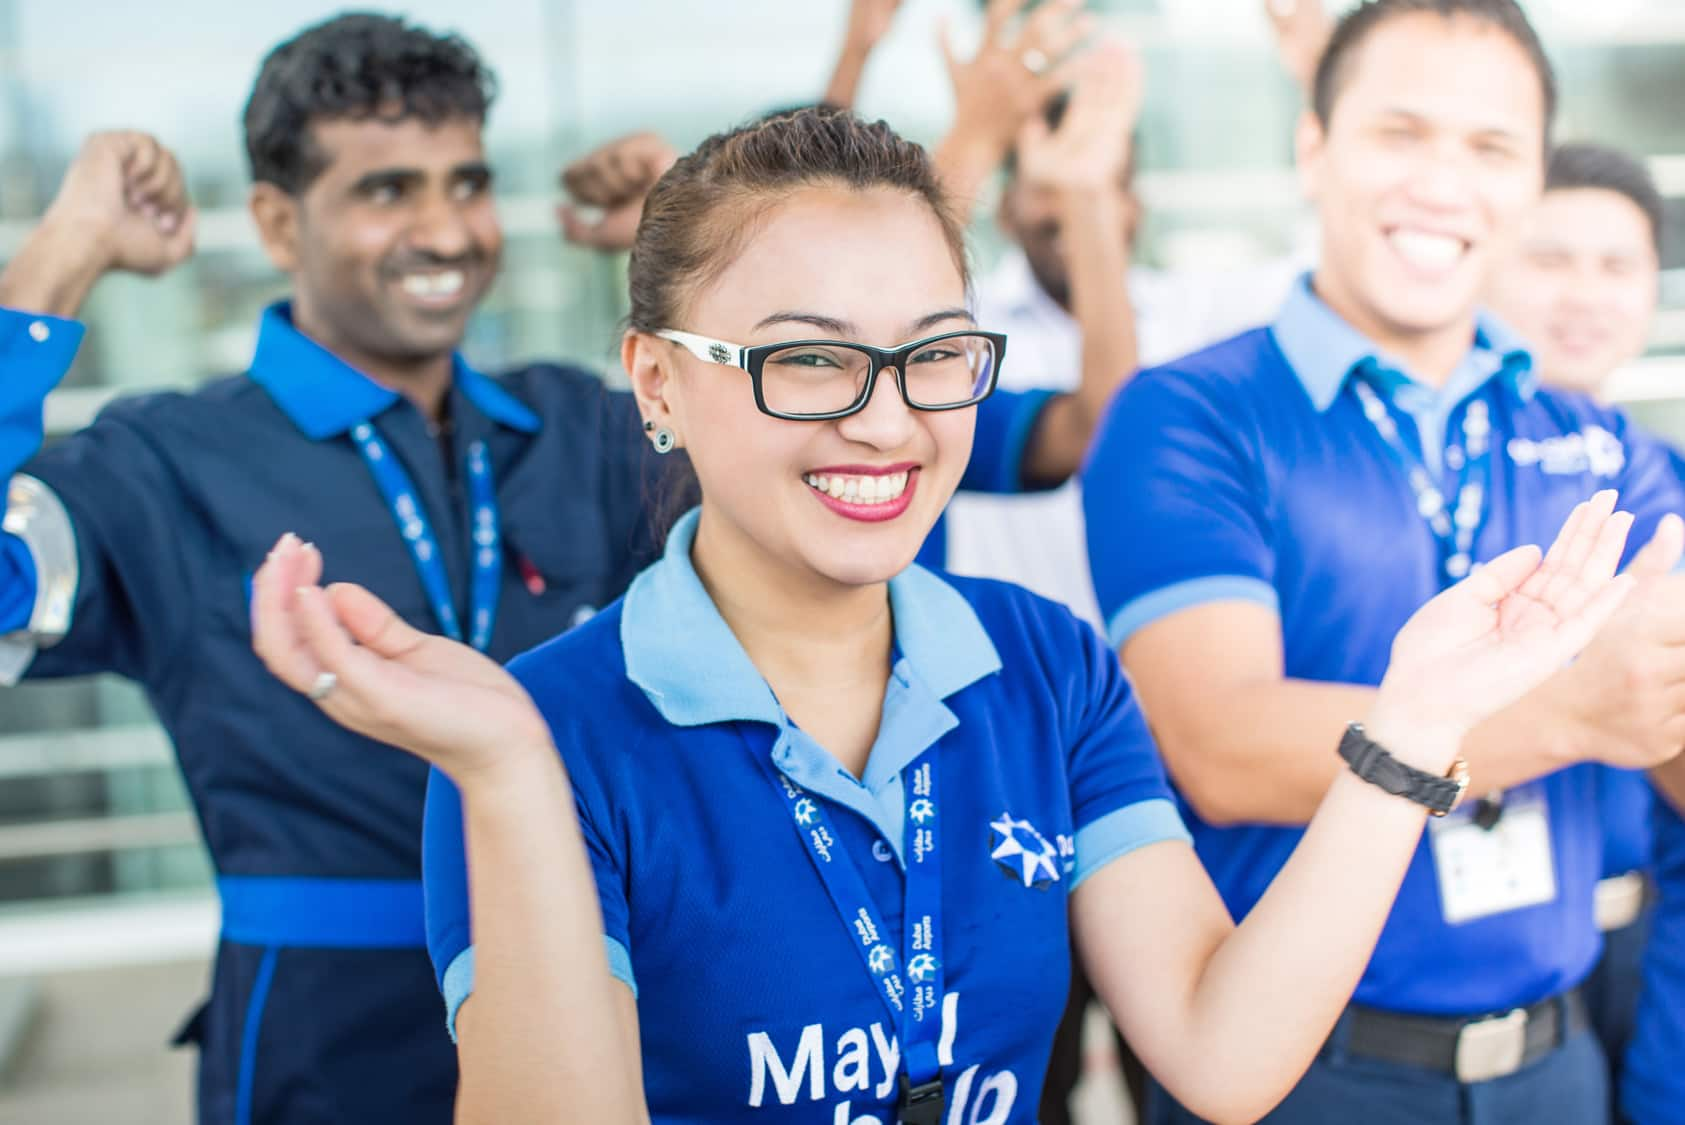 Hospitality customer experience design for Dubai airports